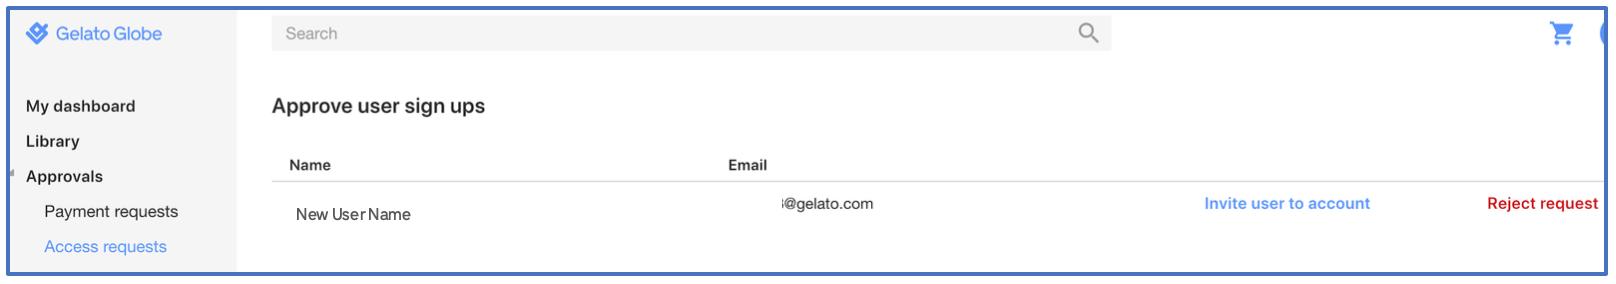 Managing User Access Requests – Gelato Globe